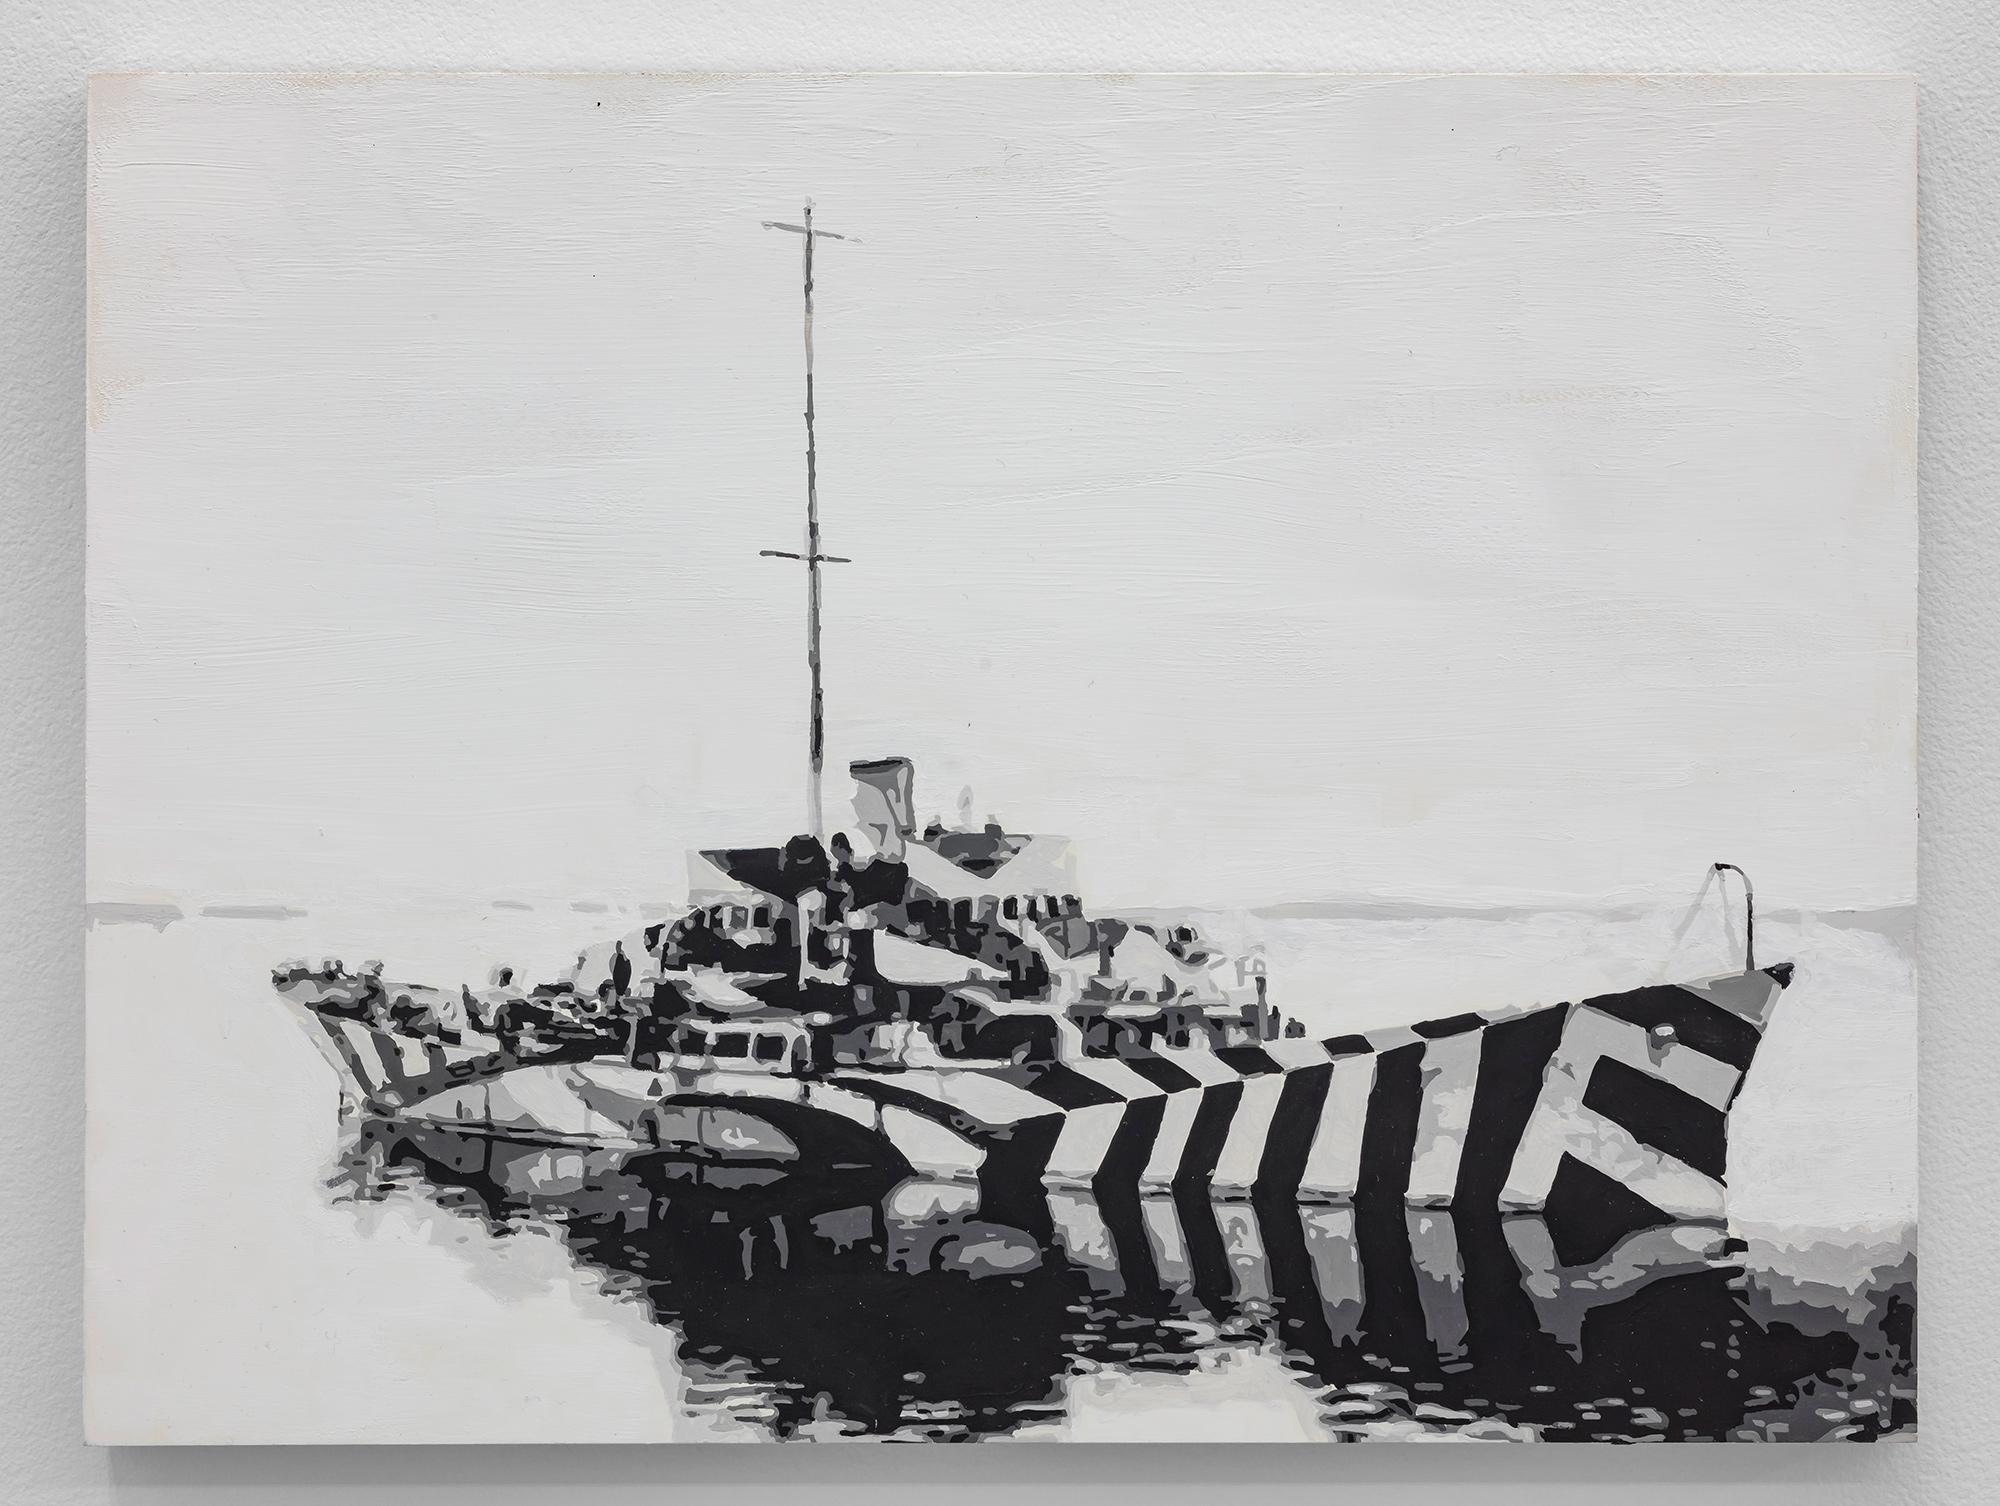 Dorian FitzGerald,  HMS Kilbride, Milford Haven, 13 January, 1919  , 2019 holbein acryla gouache on board, 9 x 12 inches